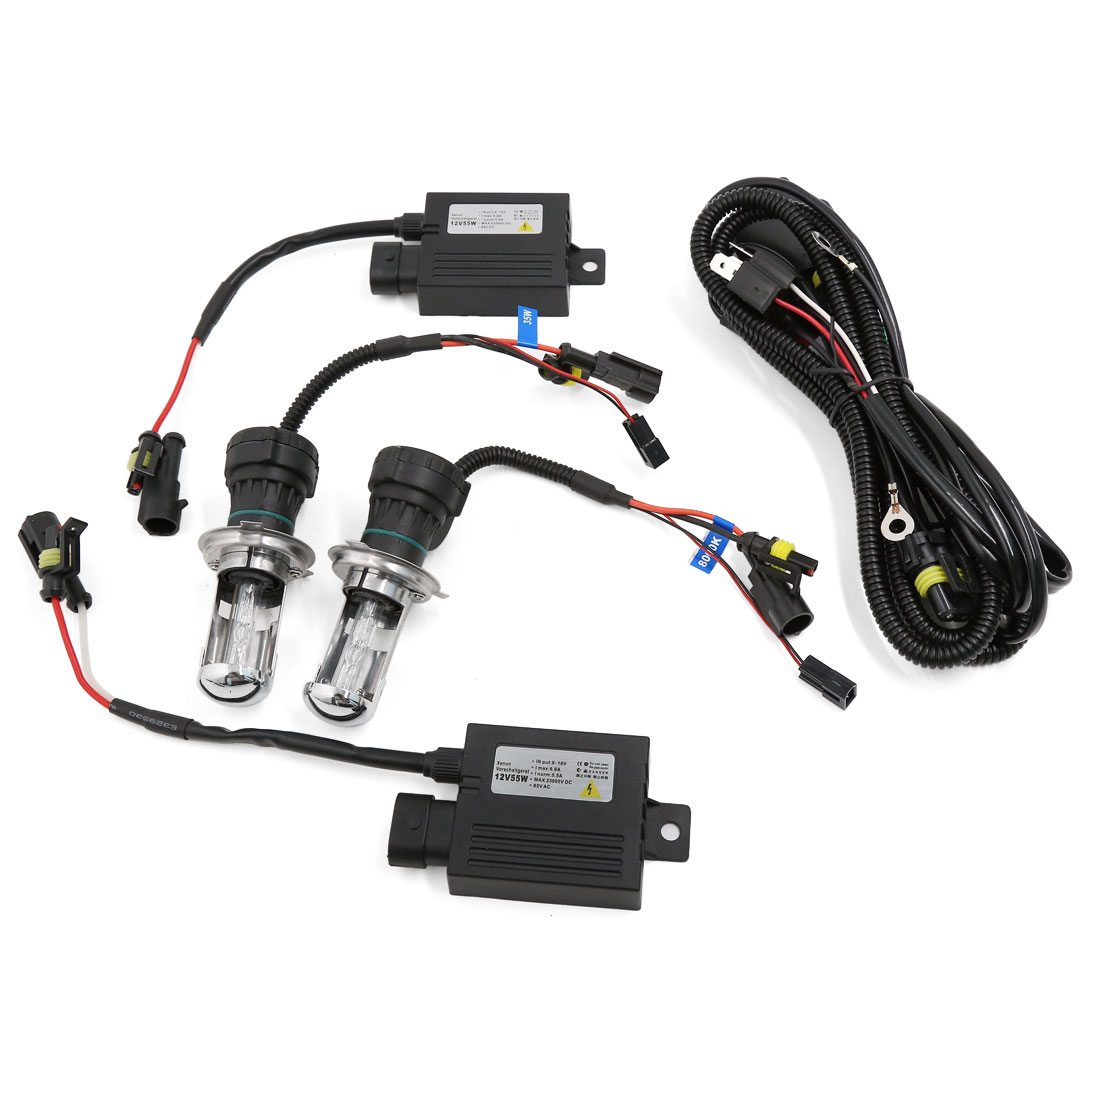 4300K H4 Hi/Lo Beam Bi-Xenon HID Lamp Bulb Conversion Controller Harness Kit 55W